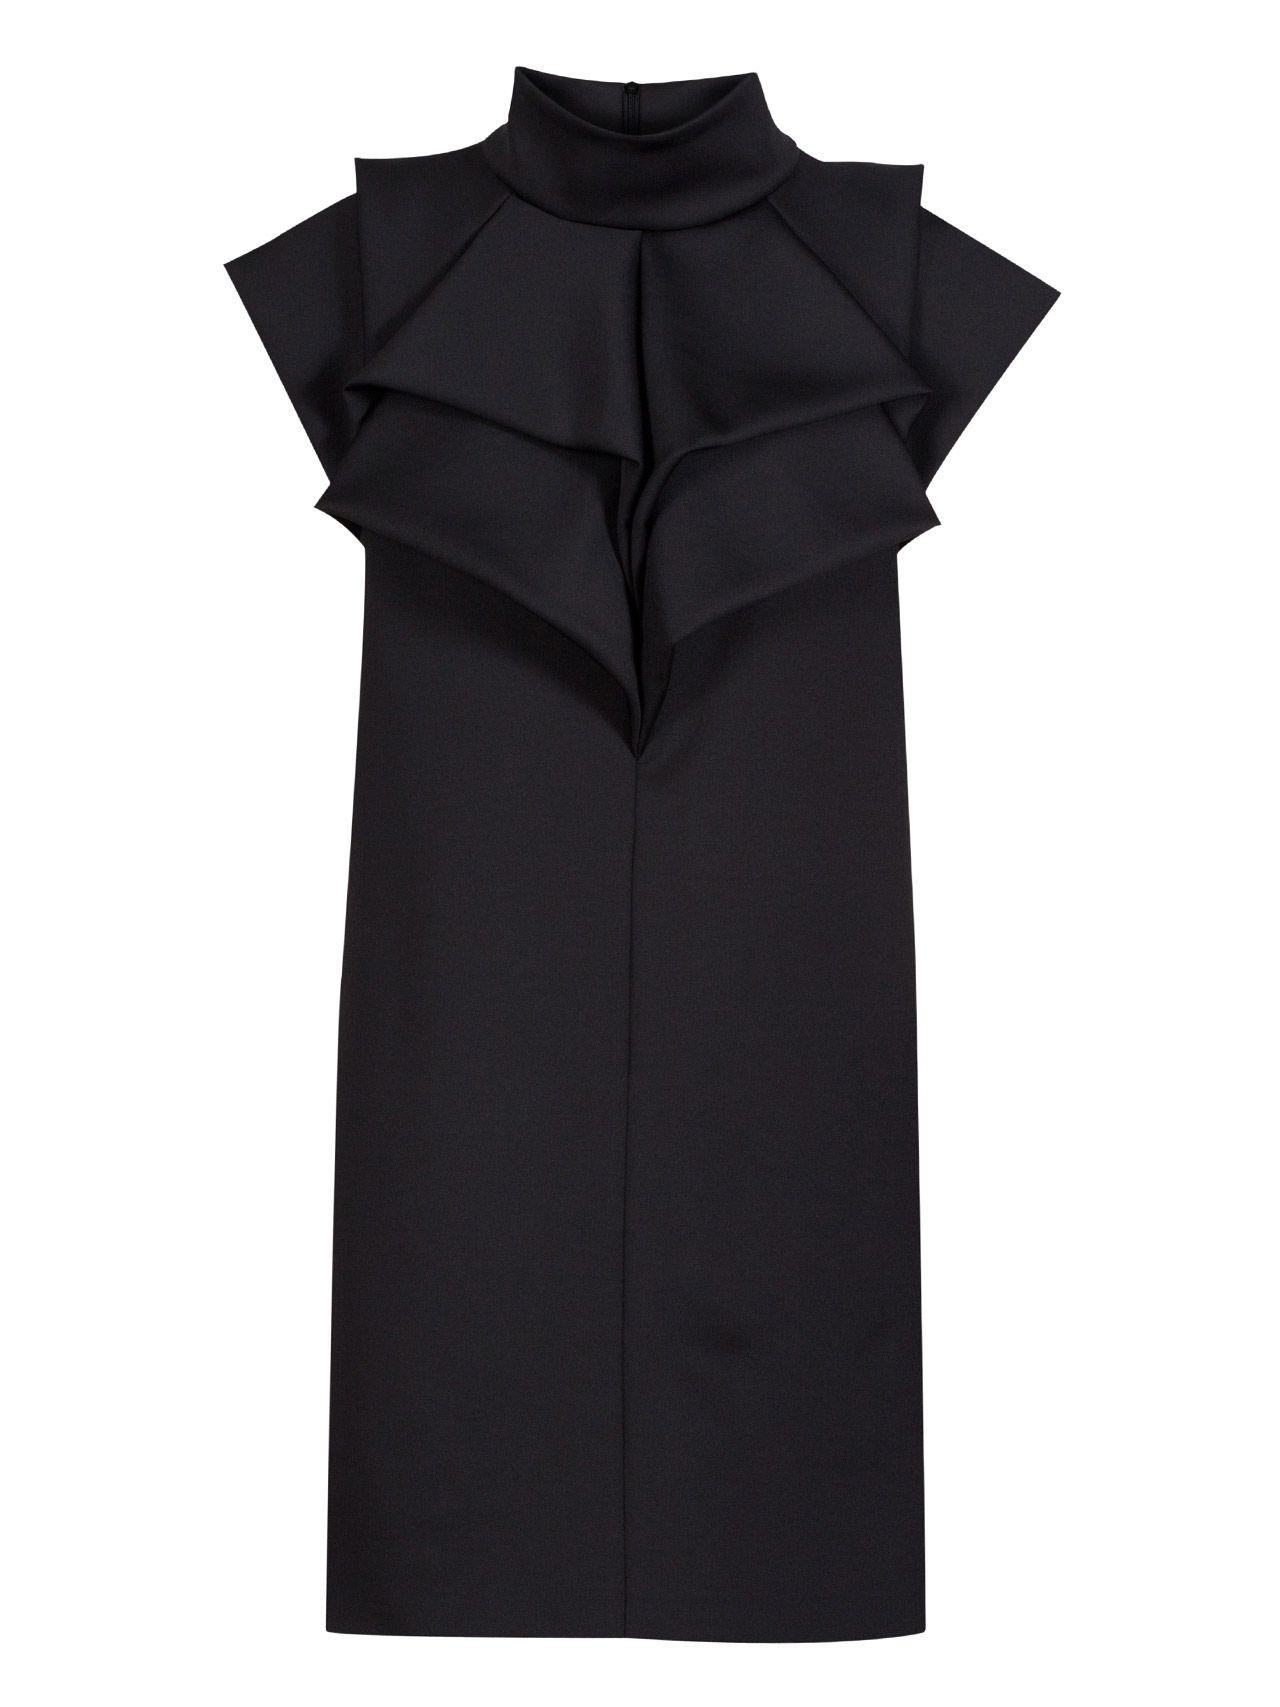 https://www.amayaarzuaga.com/amaya-eshop/productos/ficha/vestidos/571/